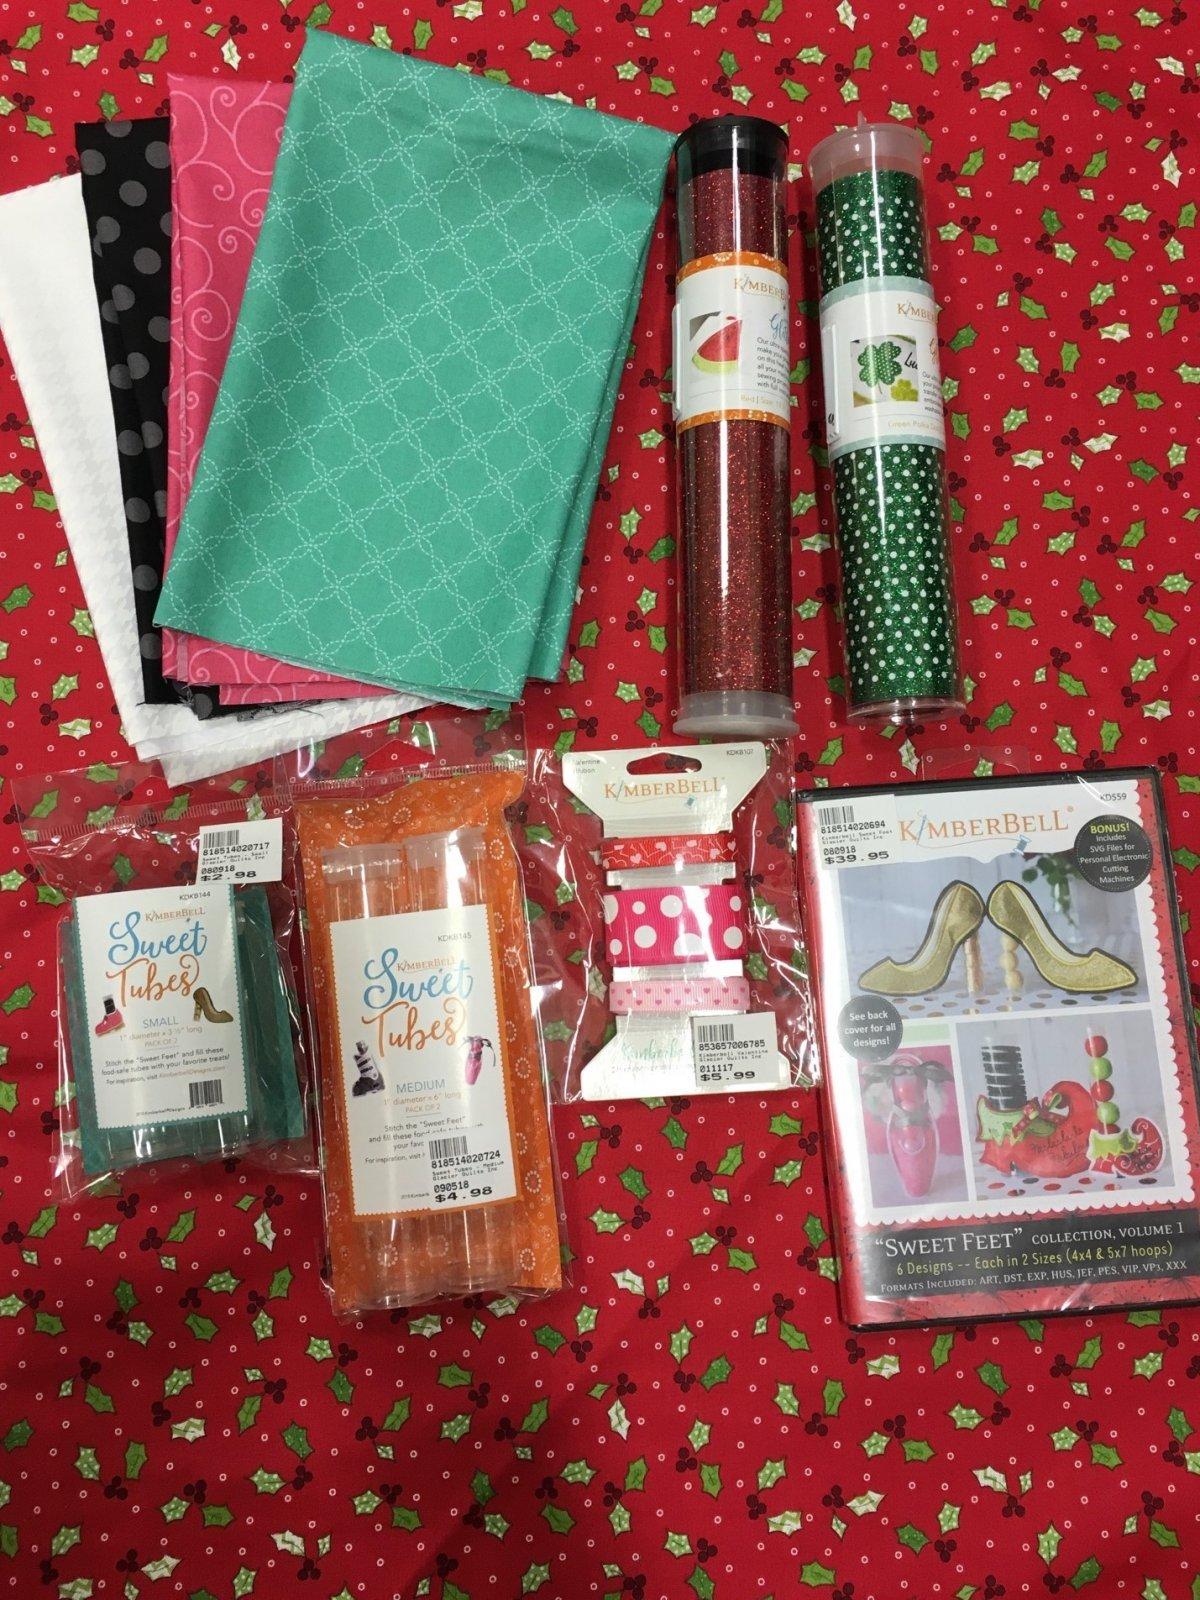 Kimberbell Gift Set 3